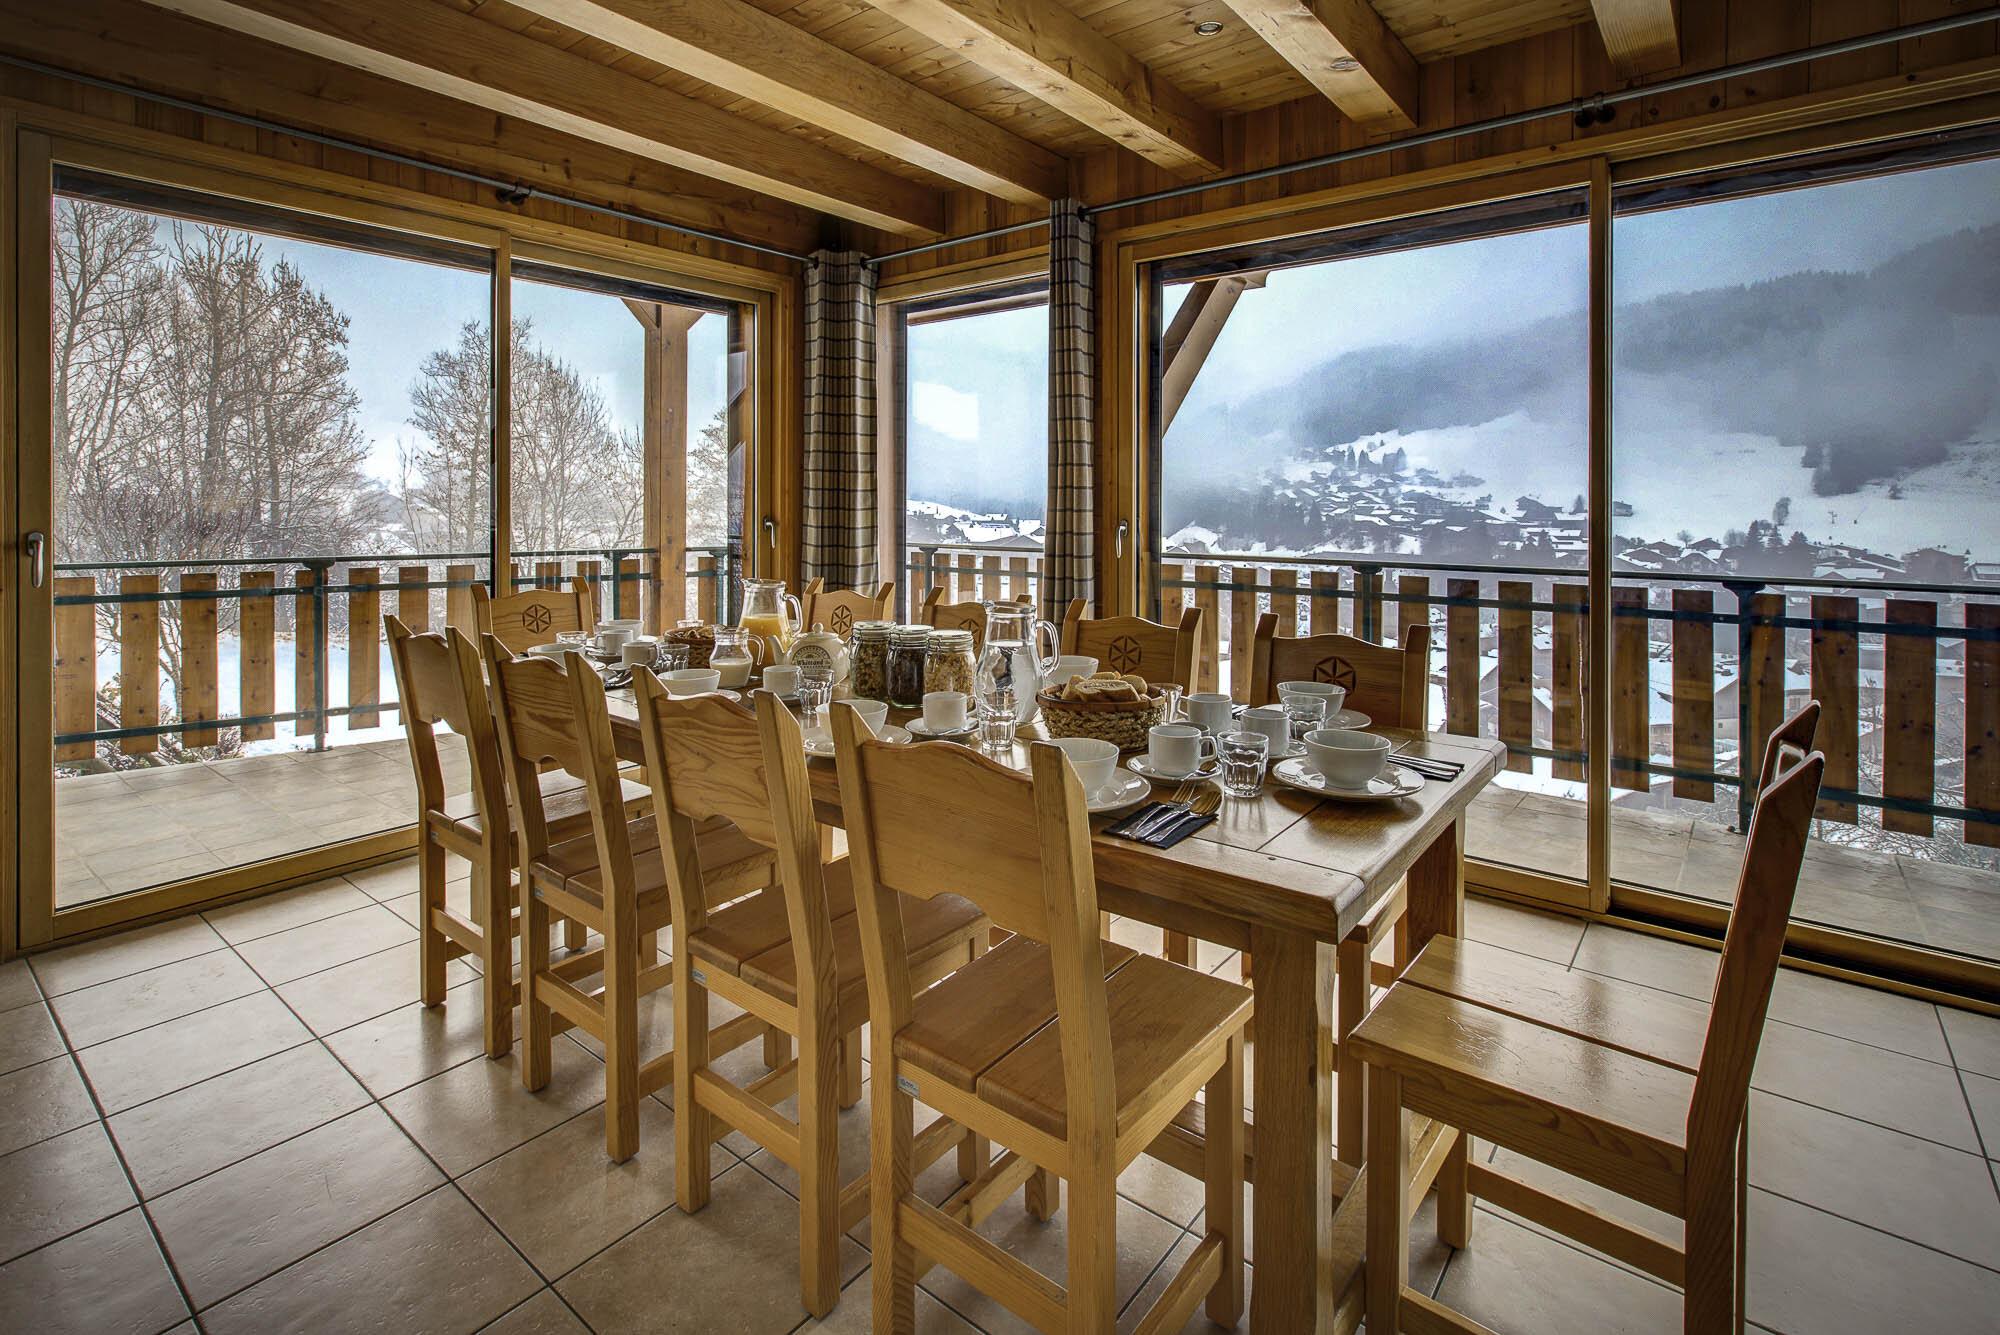 tg-ski-chalet-le-roc-soleil-morzine-002.jpg